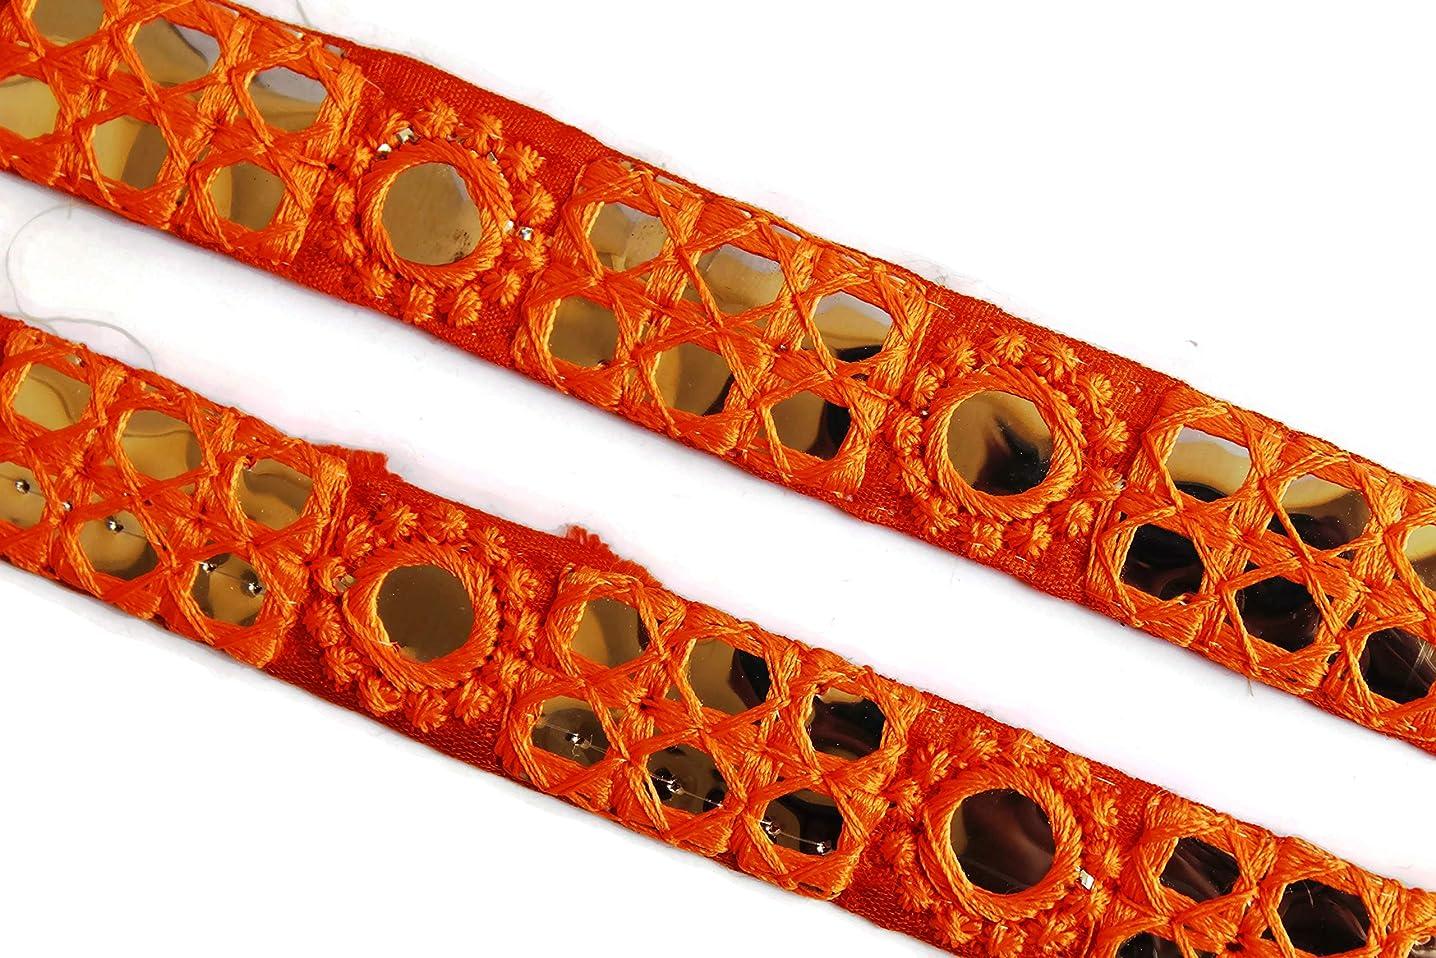 Idukaancrafts Orange Bridal Dress Trim 04 Yd 01